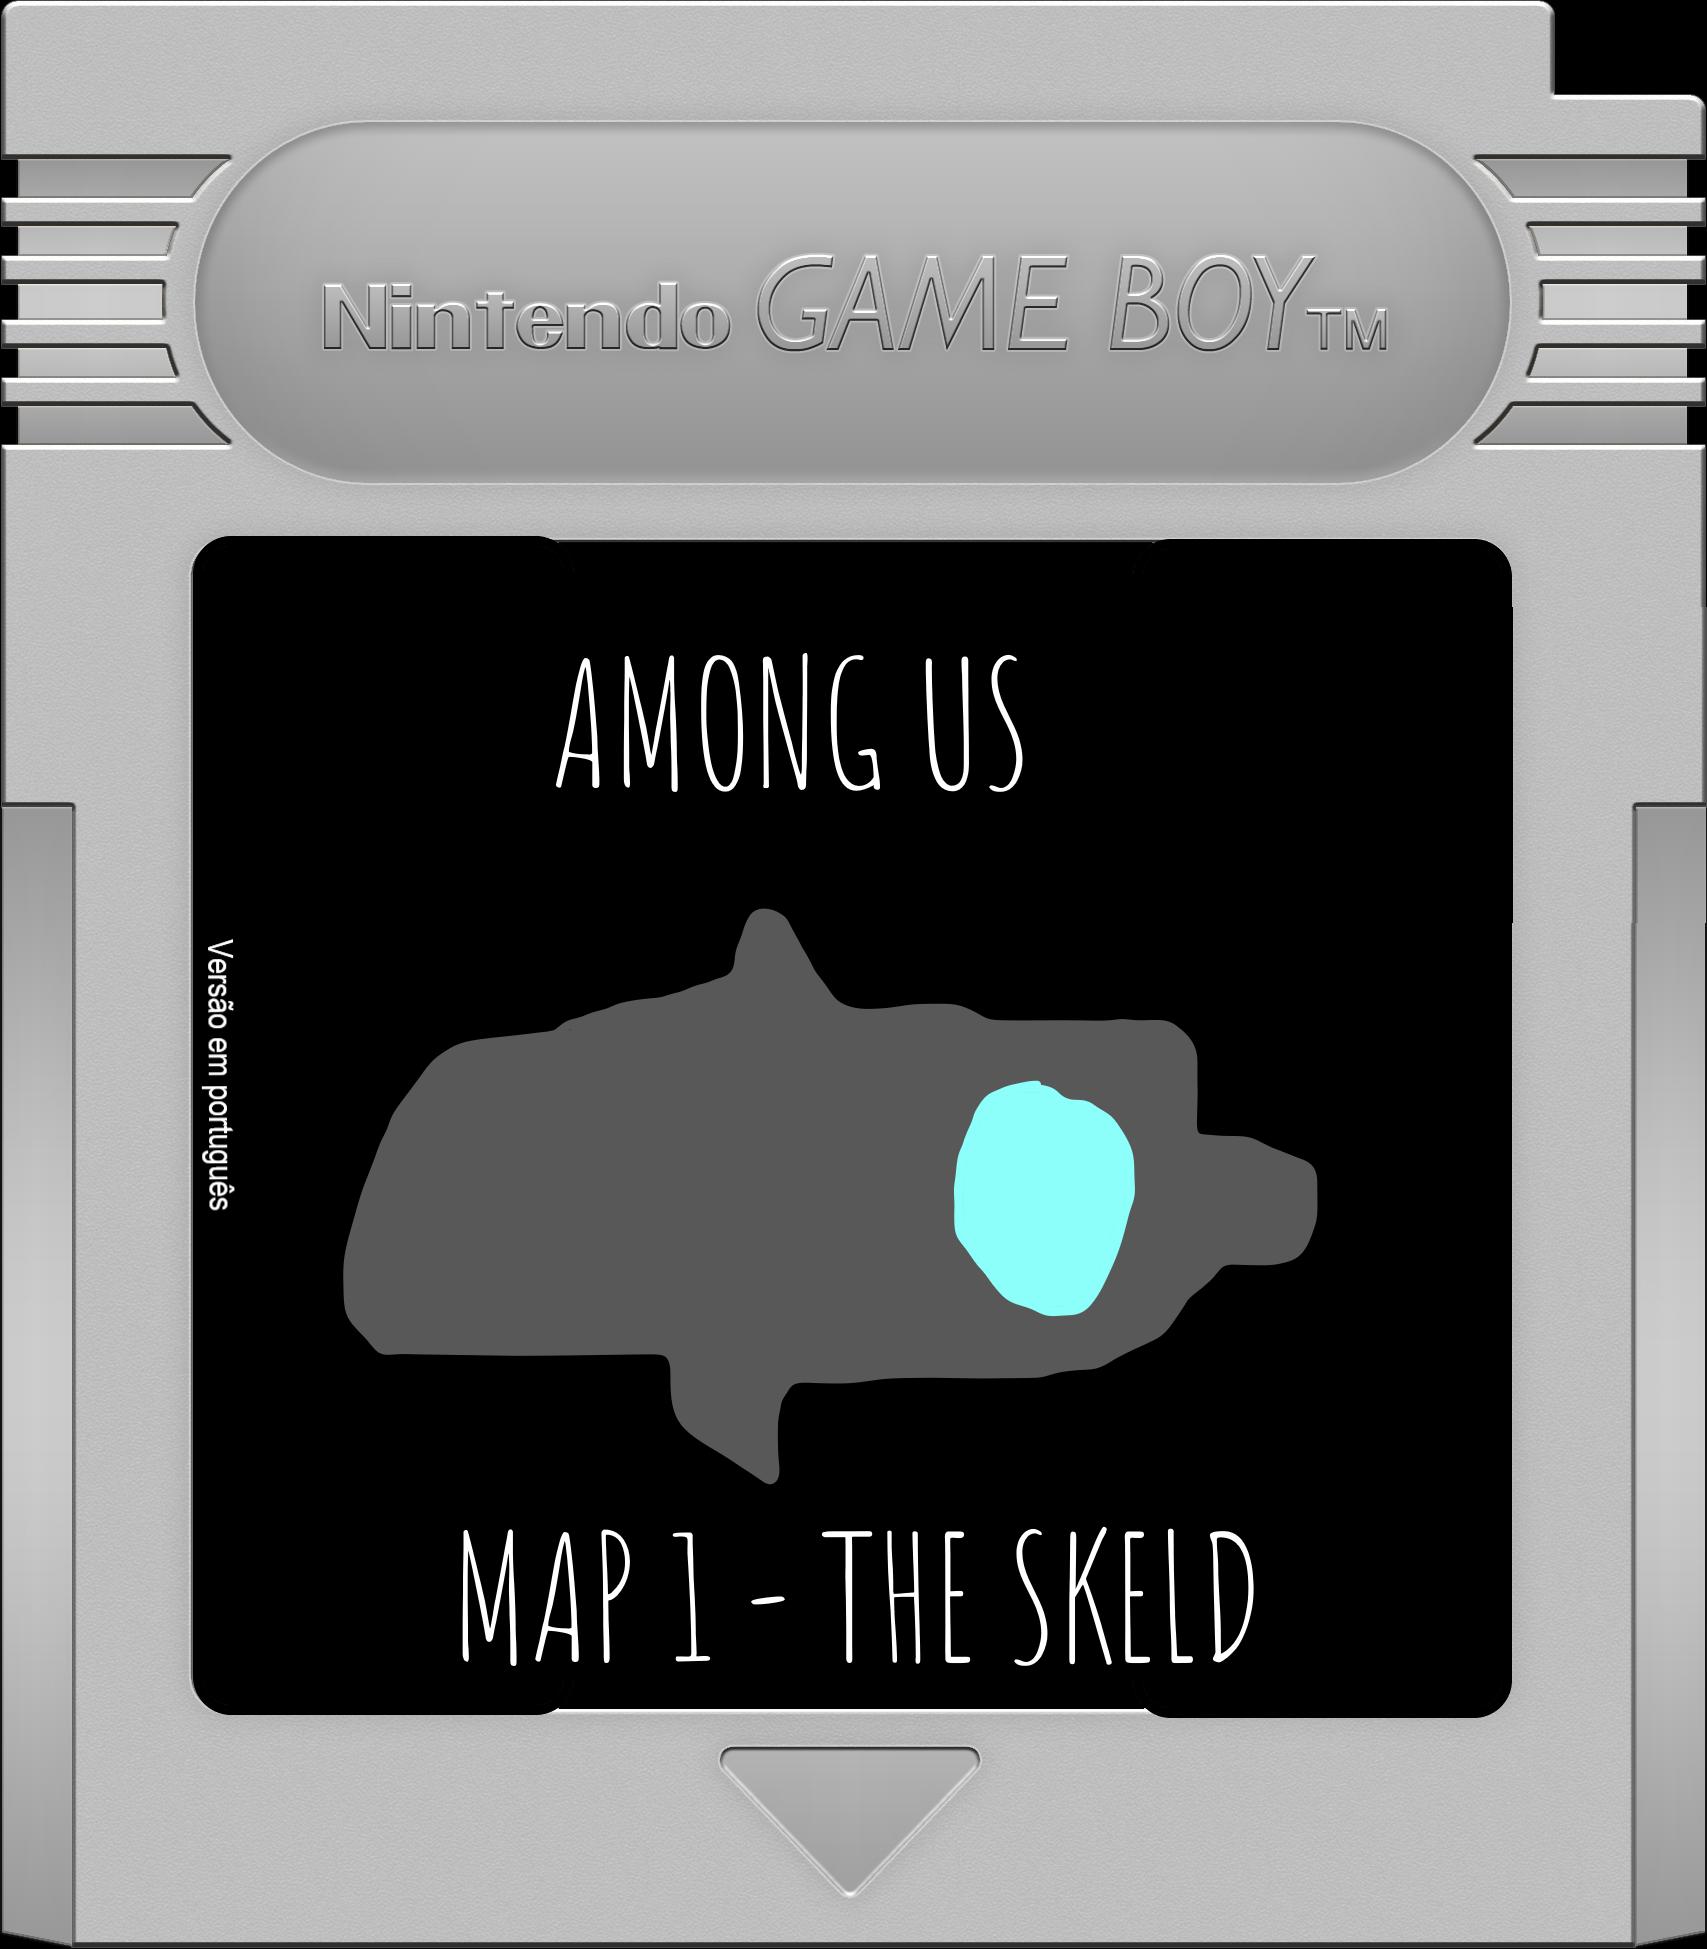 Among Us Gameboy The Skeld By Guimitomo Gui Tomotuber Jogos